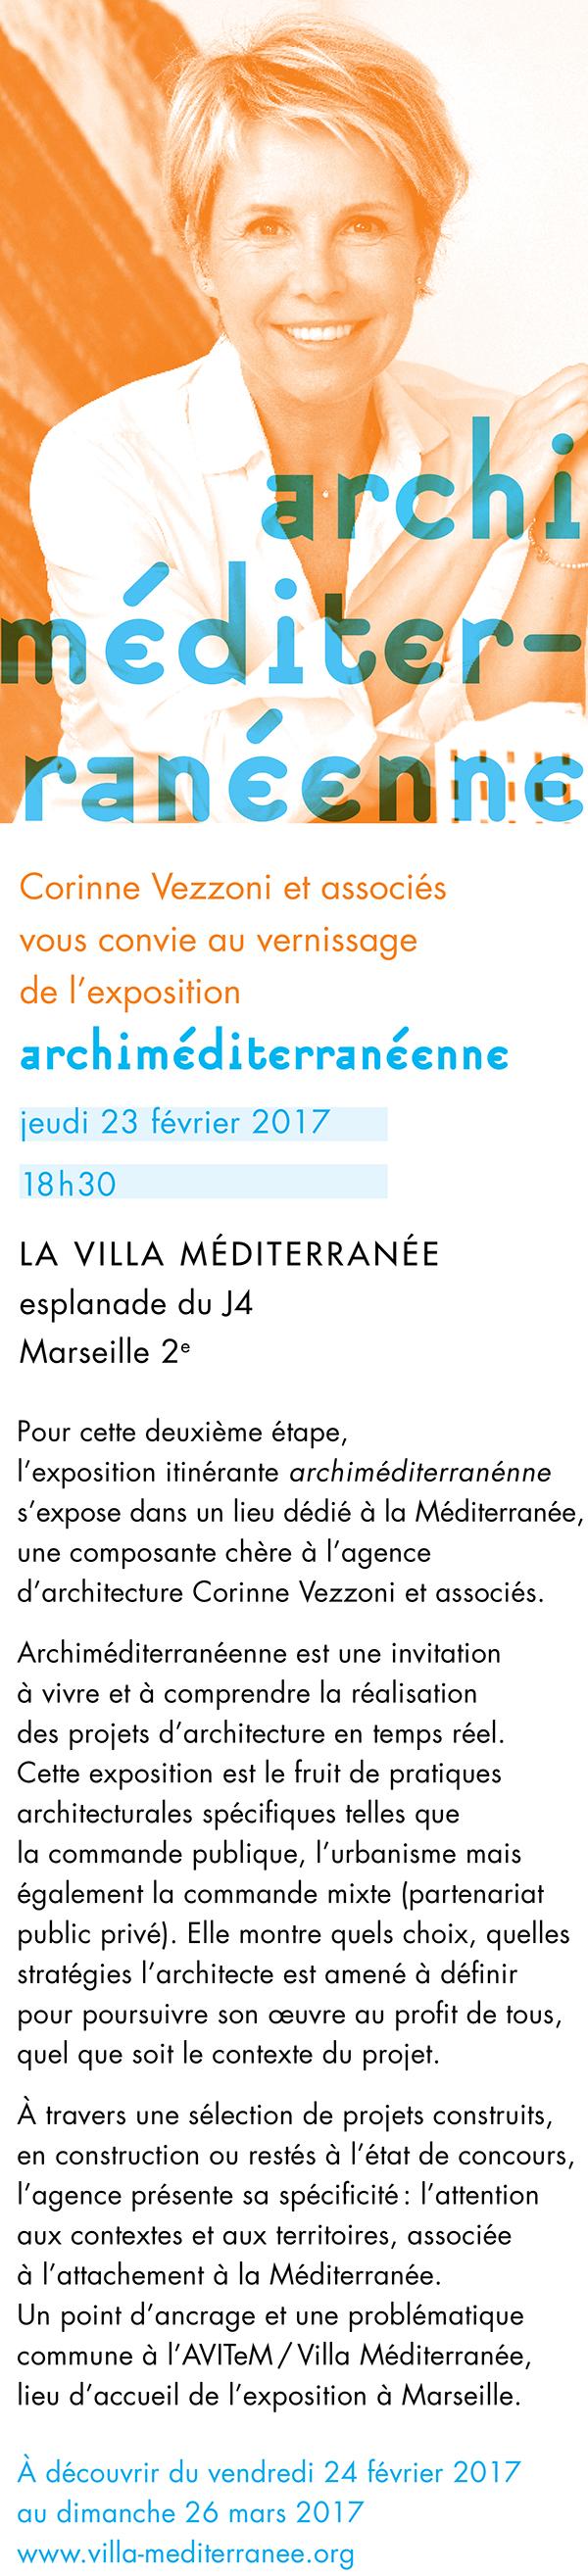 Archiméditerranéenne @ Villa Méditerranée